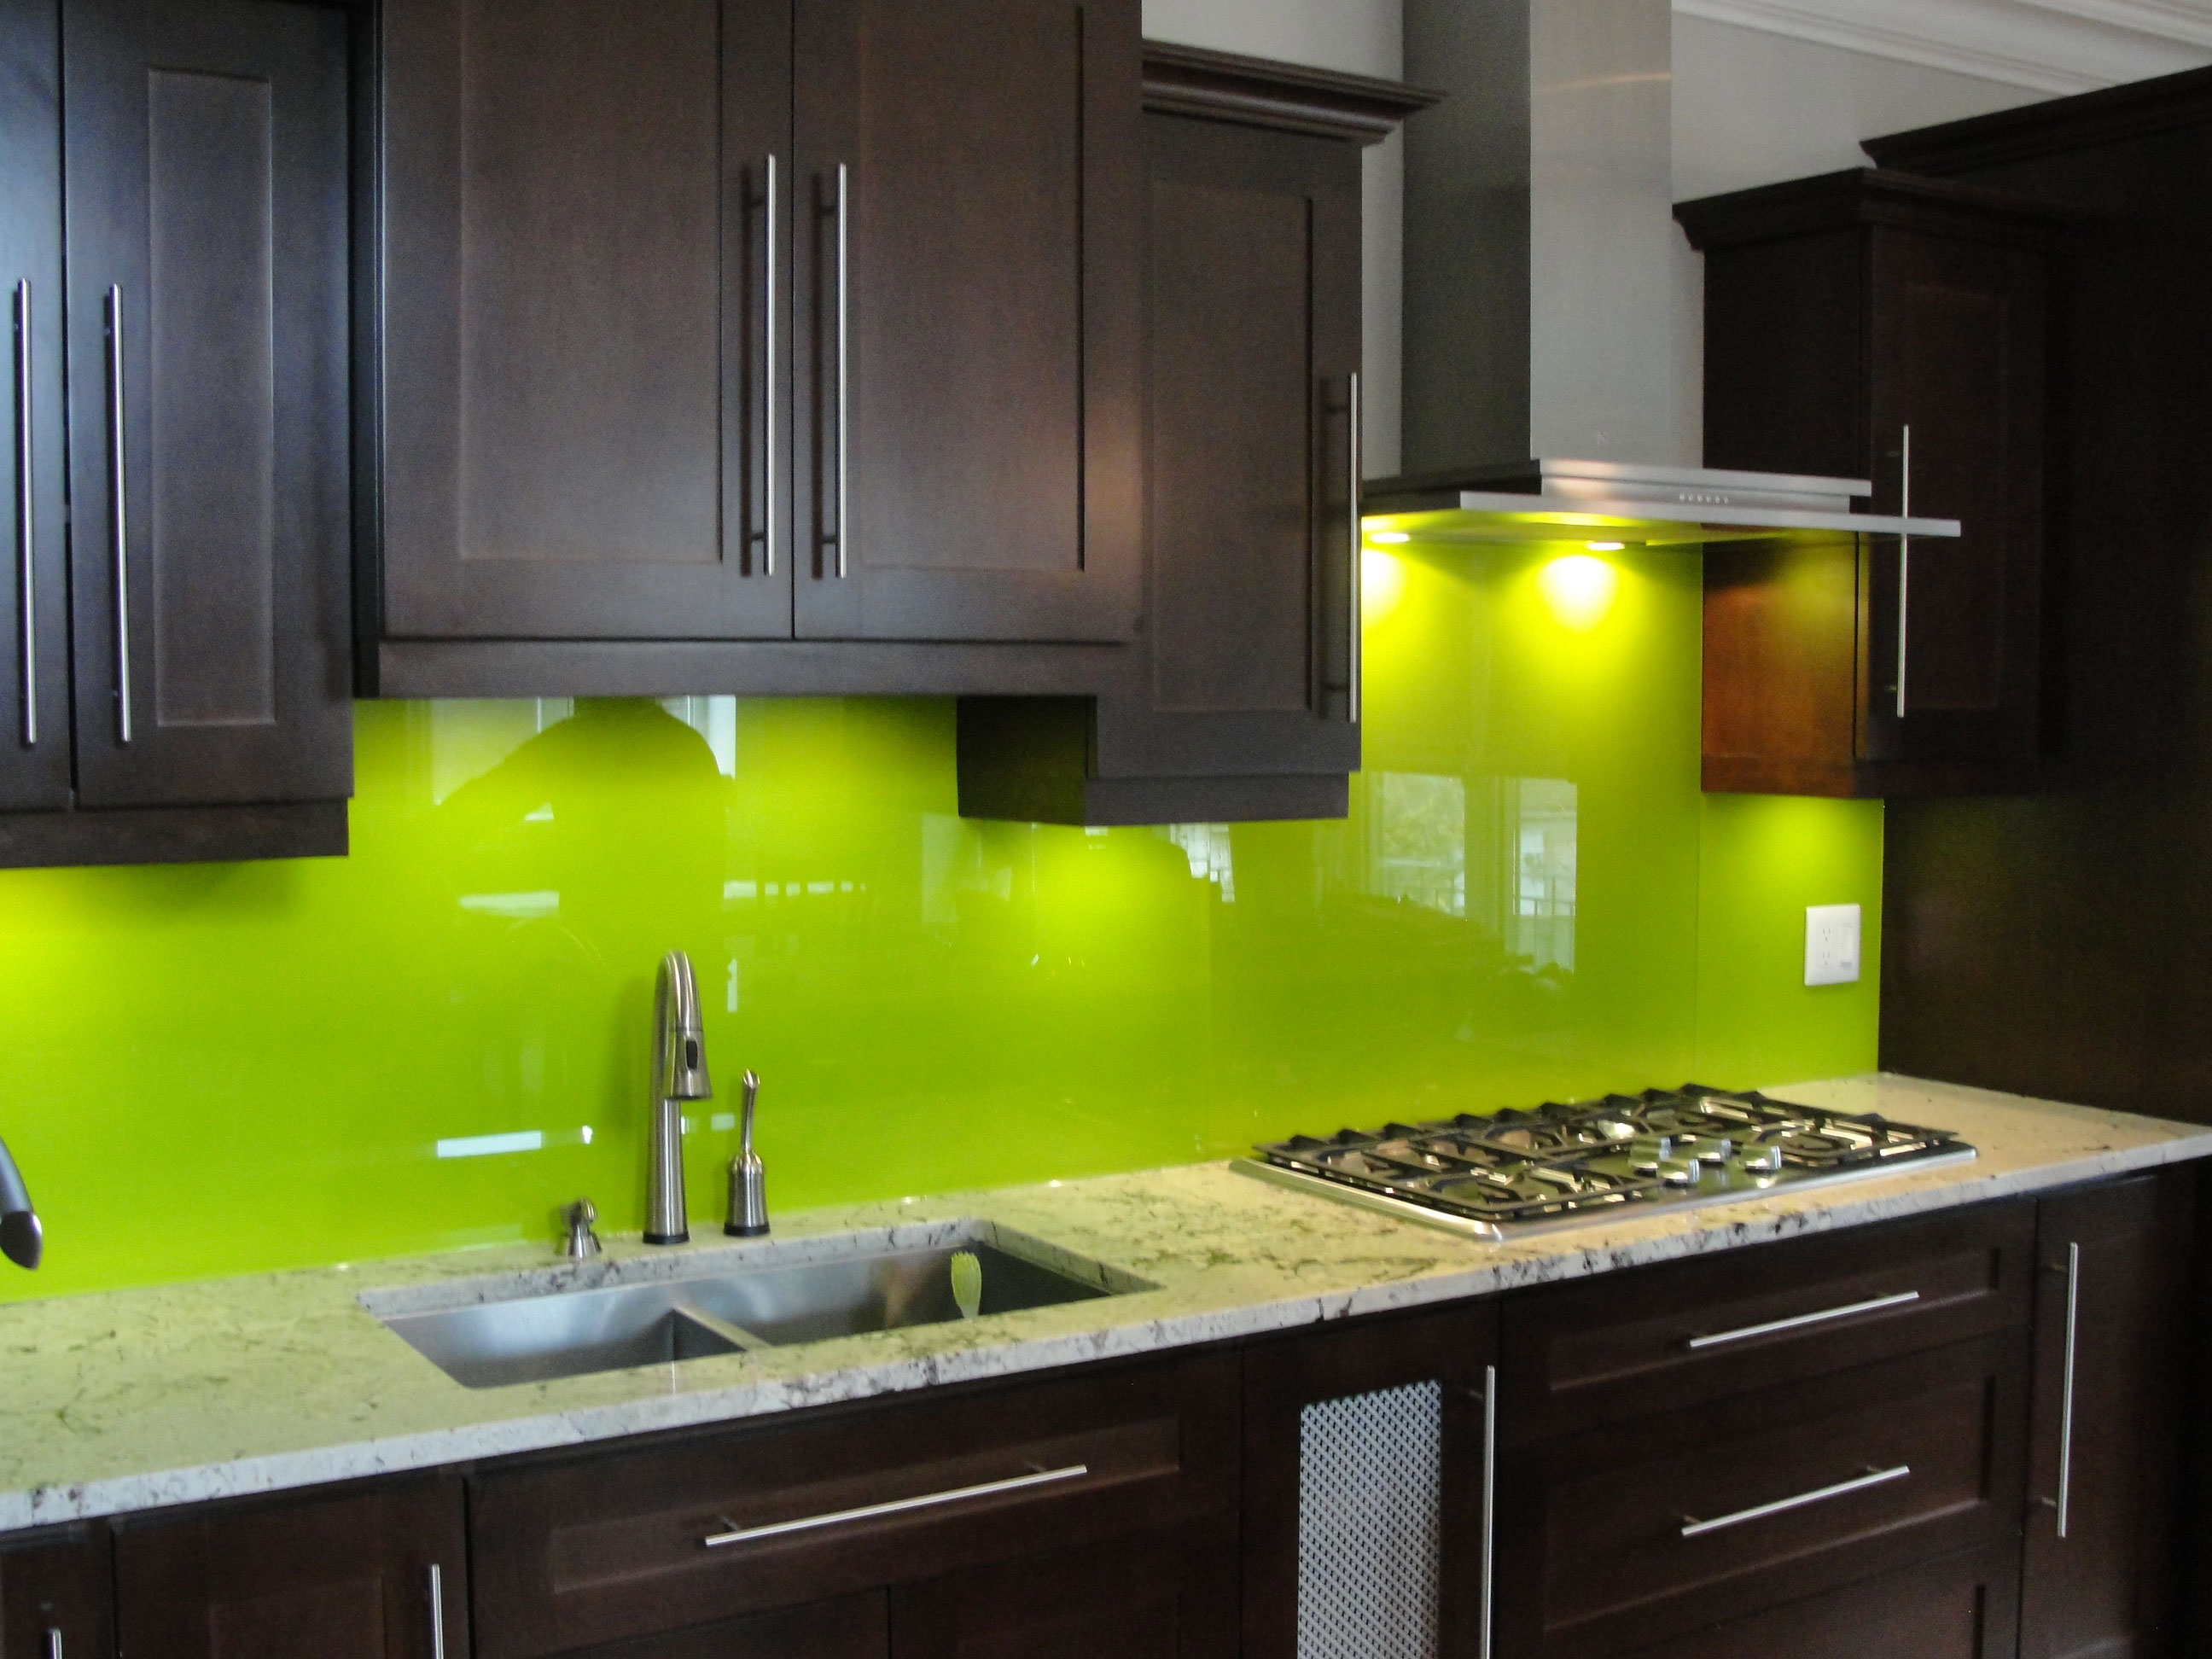 painted glass kitchen backsplash couchable glass backsplash ideas backsplash designs kitchen glass moneytreeapp